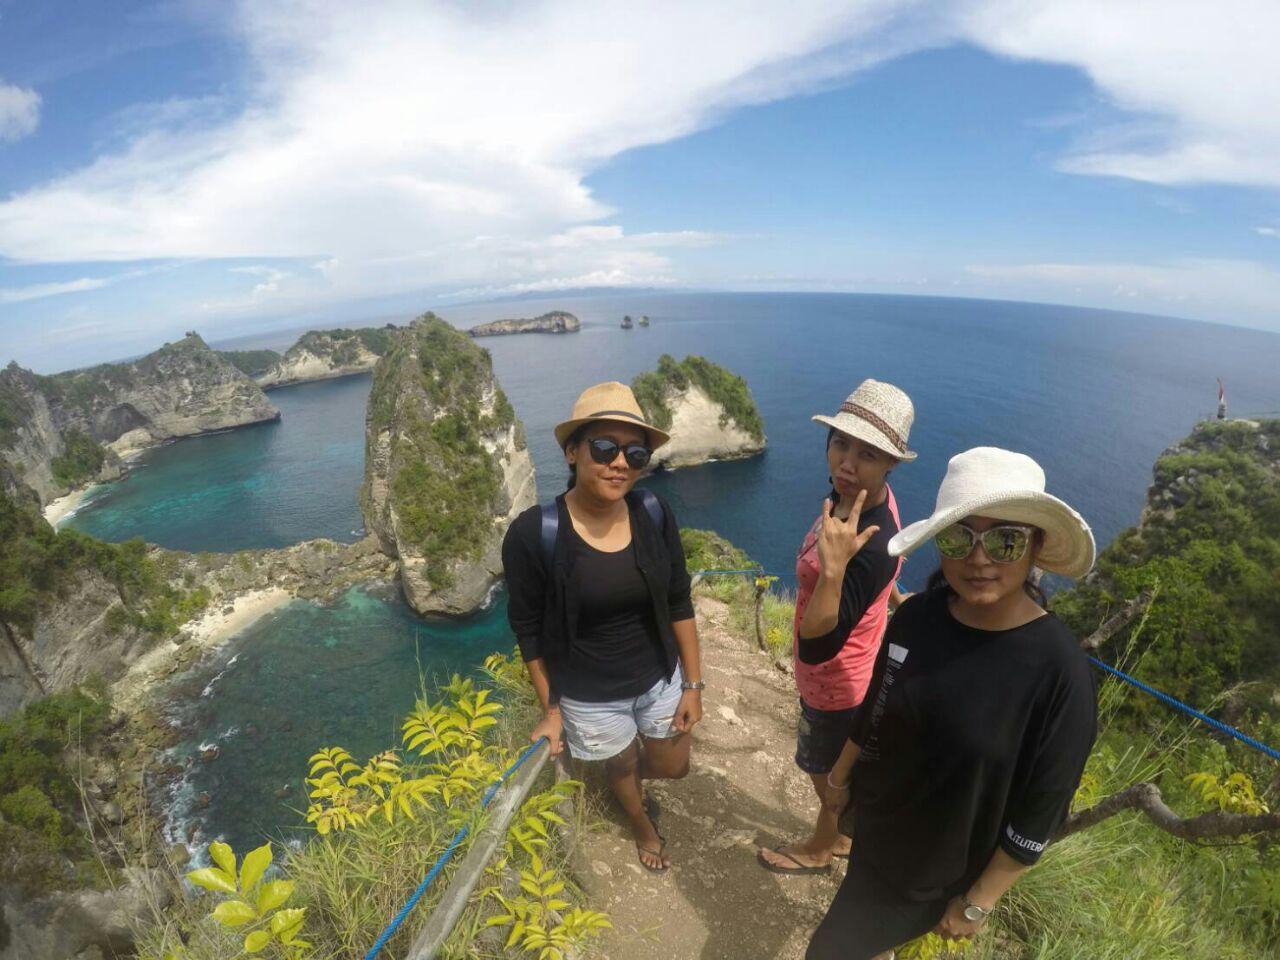 Obyek wisata Nusa Penida-Nusa Penida Tour Murah